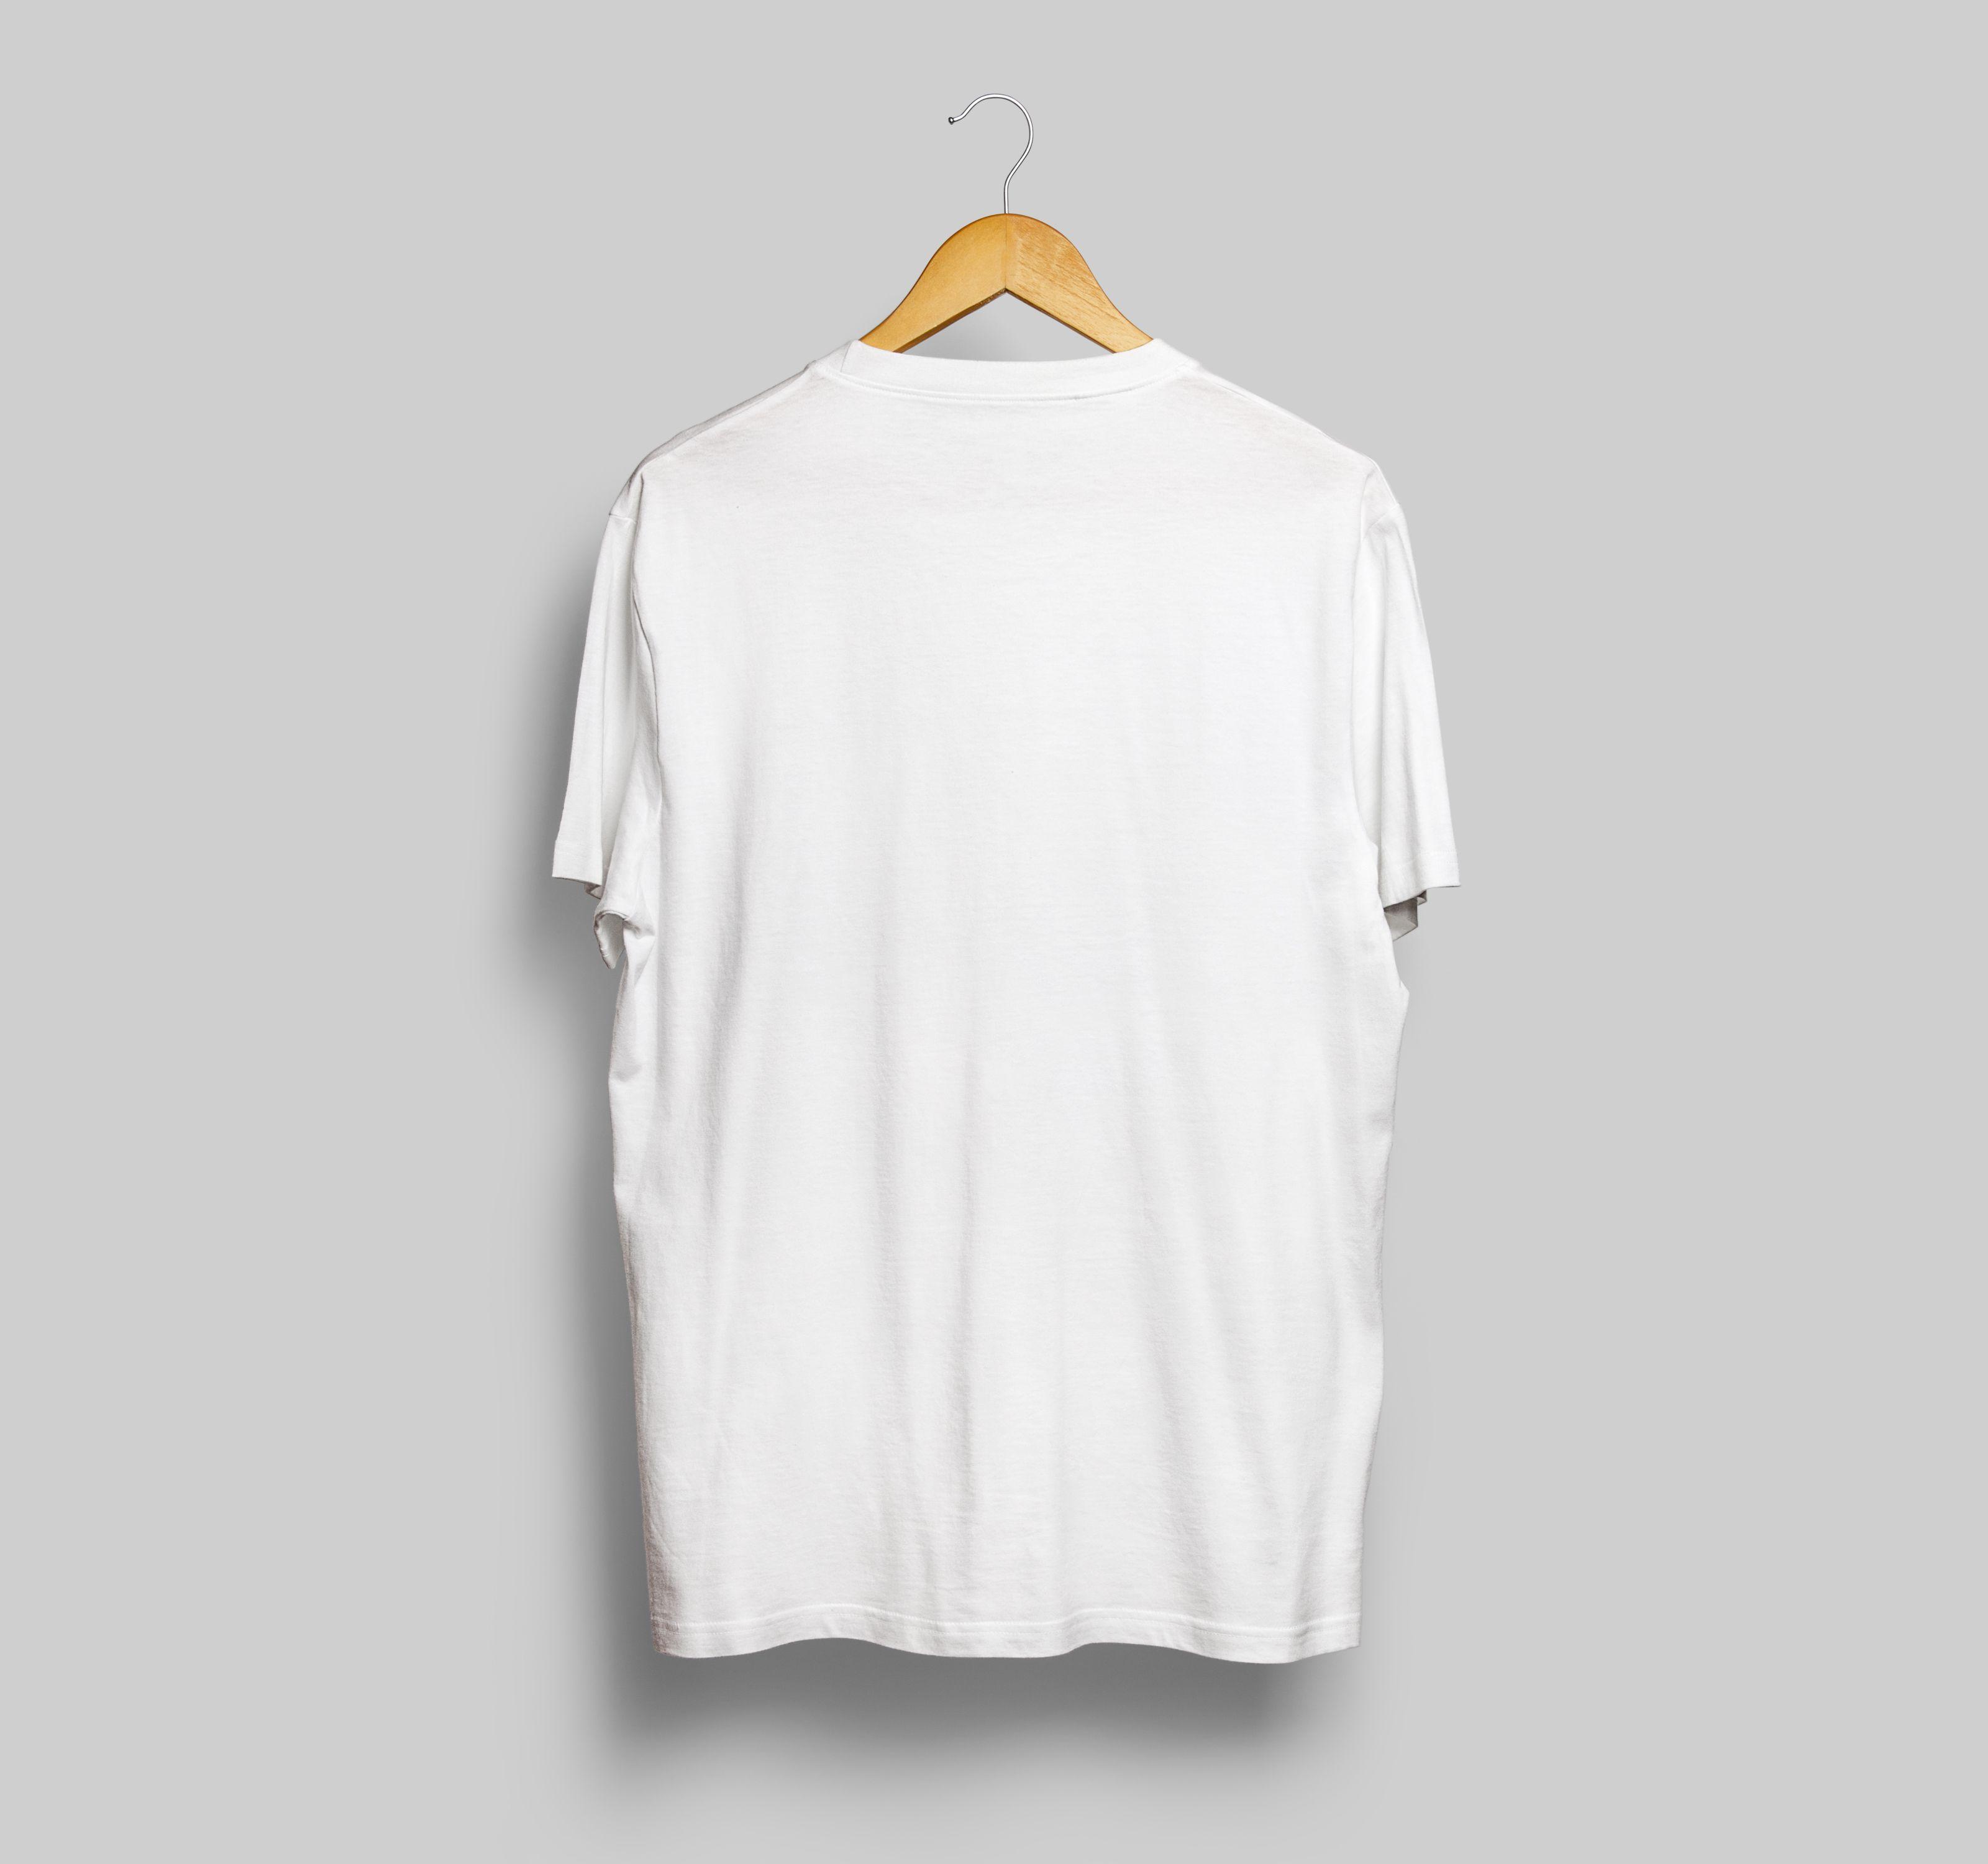 White t shirt mock up 3200 3000 mockup for T shirt mockup front and back